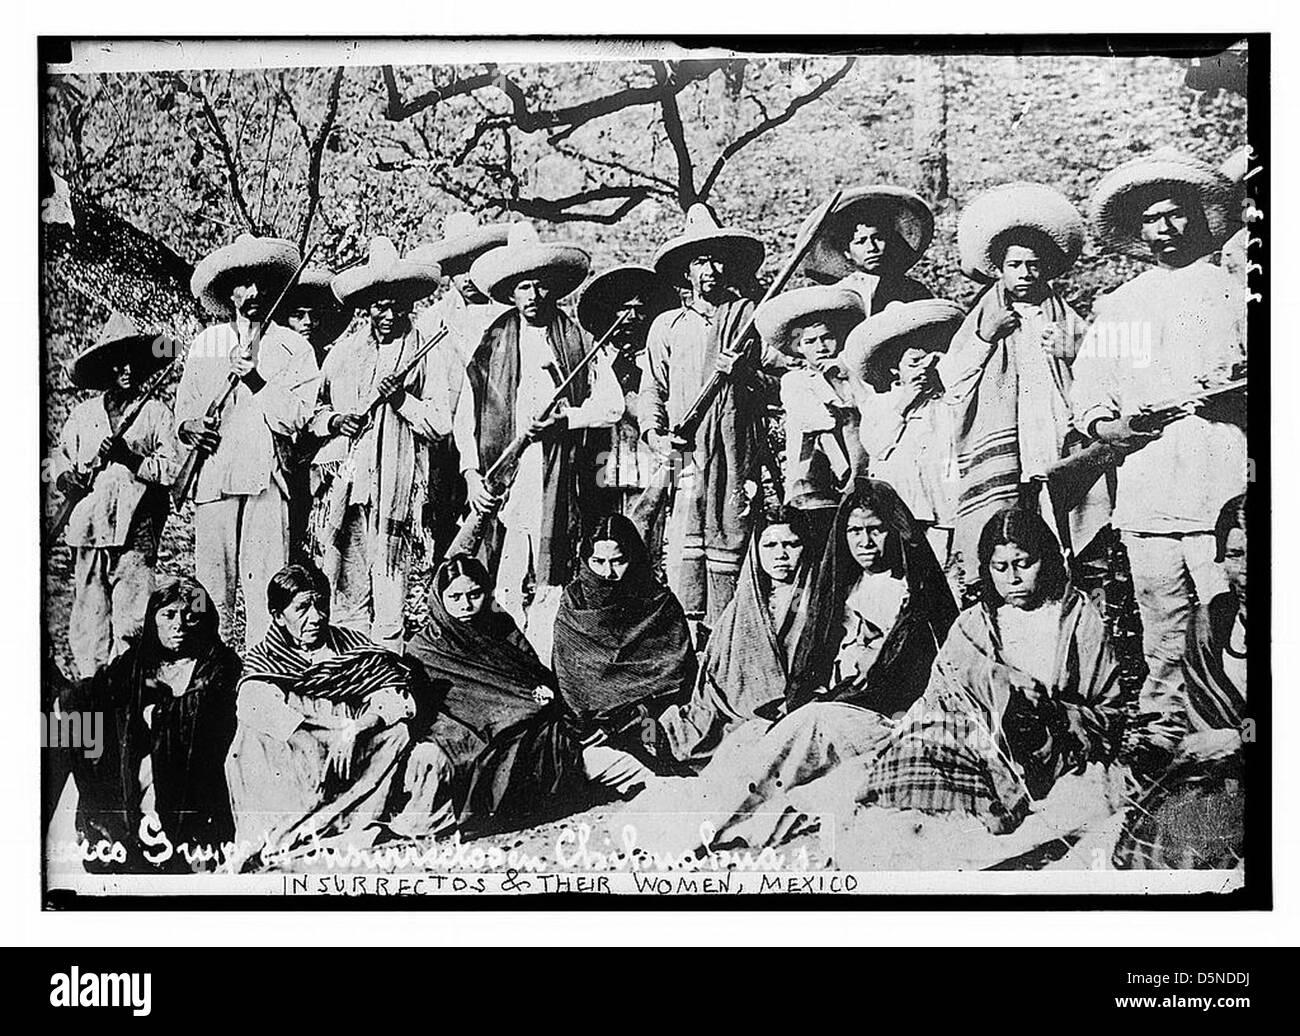 Insurrectos & their women, Mexico (LOC) - Stock Image